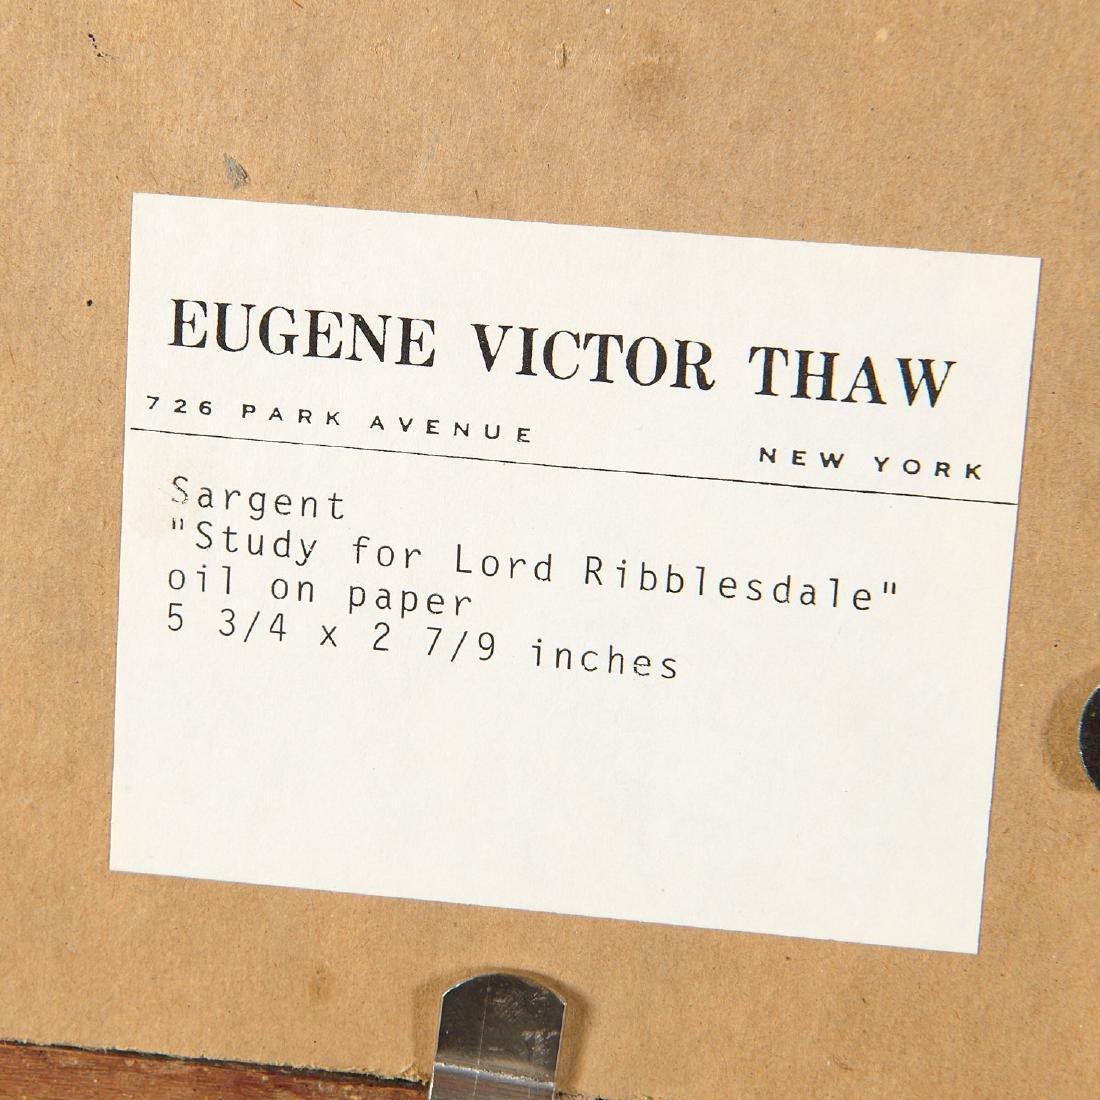 John Singer Sargent (attrib.), Lord Ribblesdale - 7